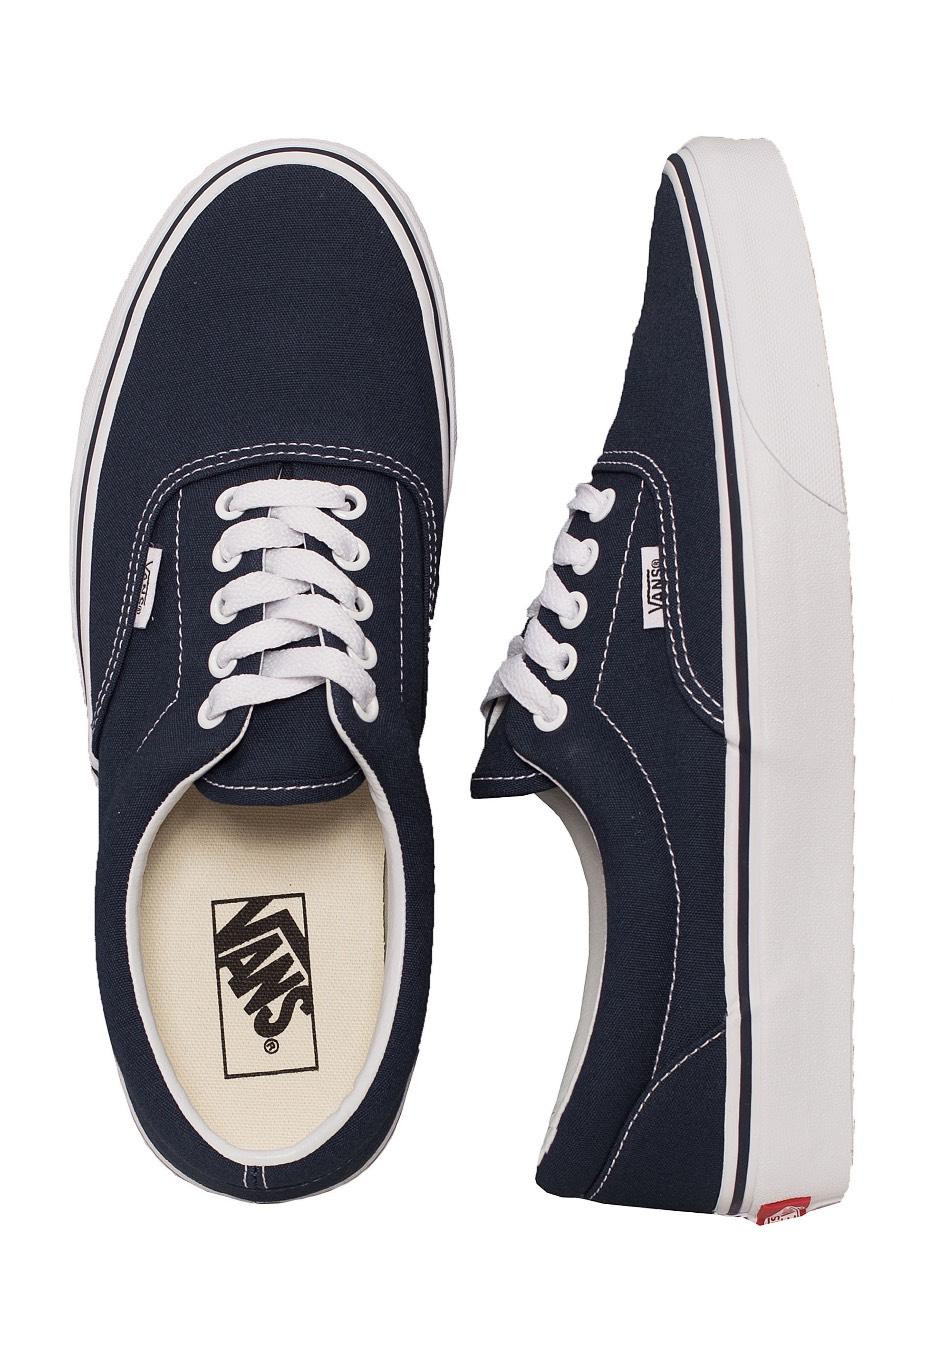 d892ac5576 Vans - Era Navy - Girl Shoes - Impericon.com Worldwide